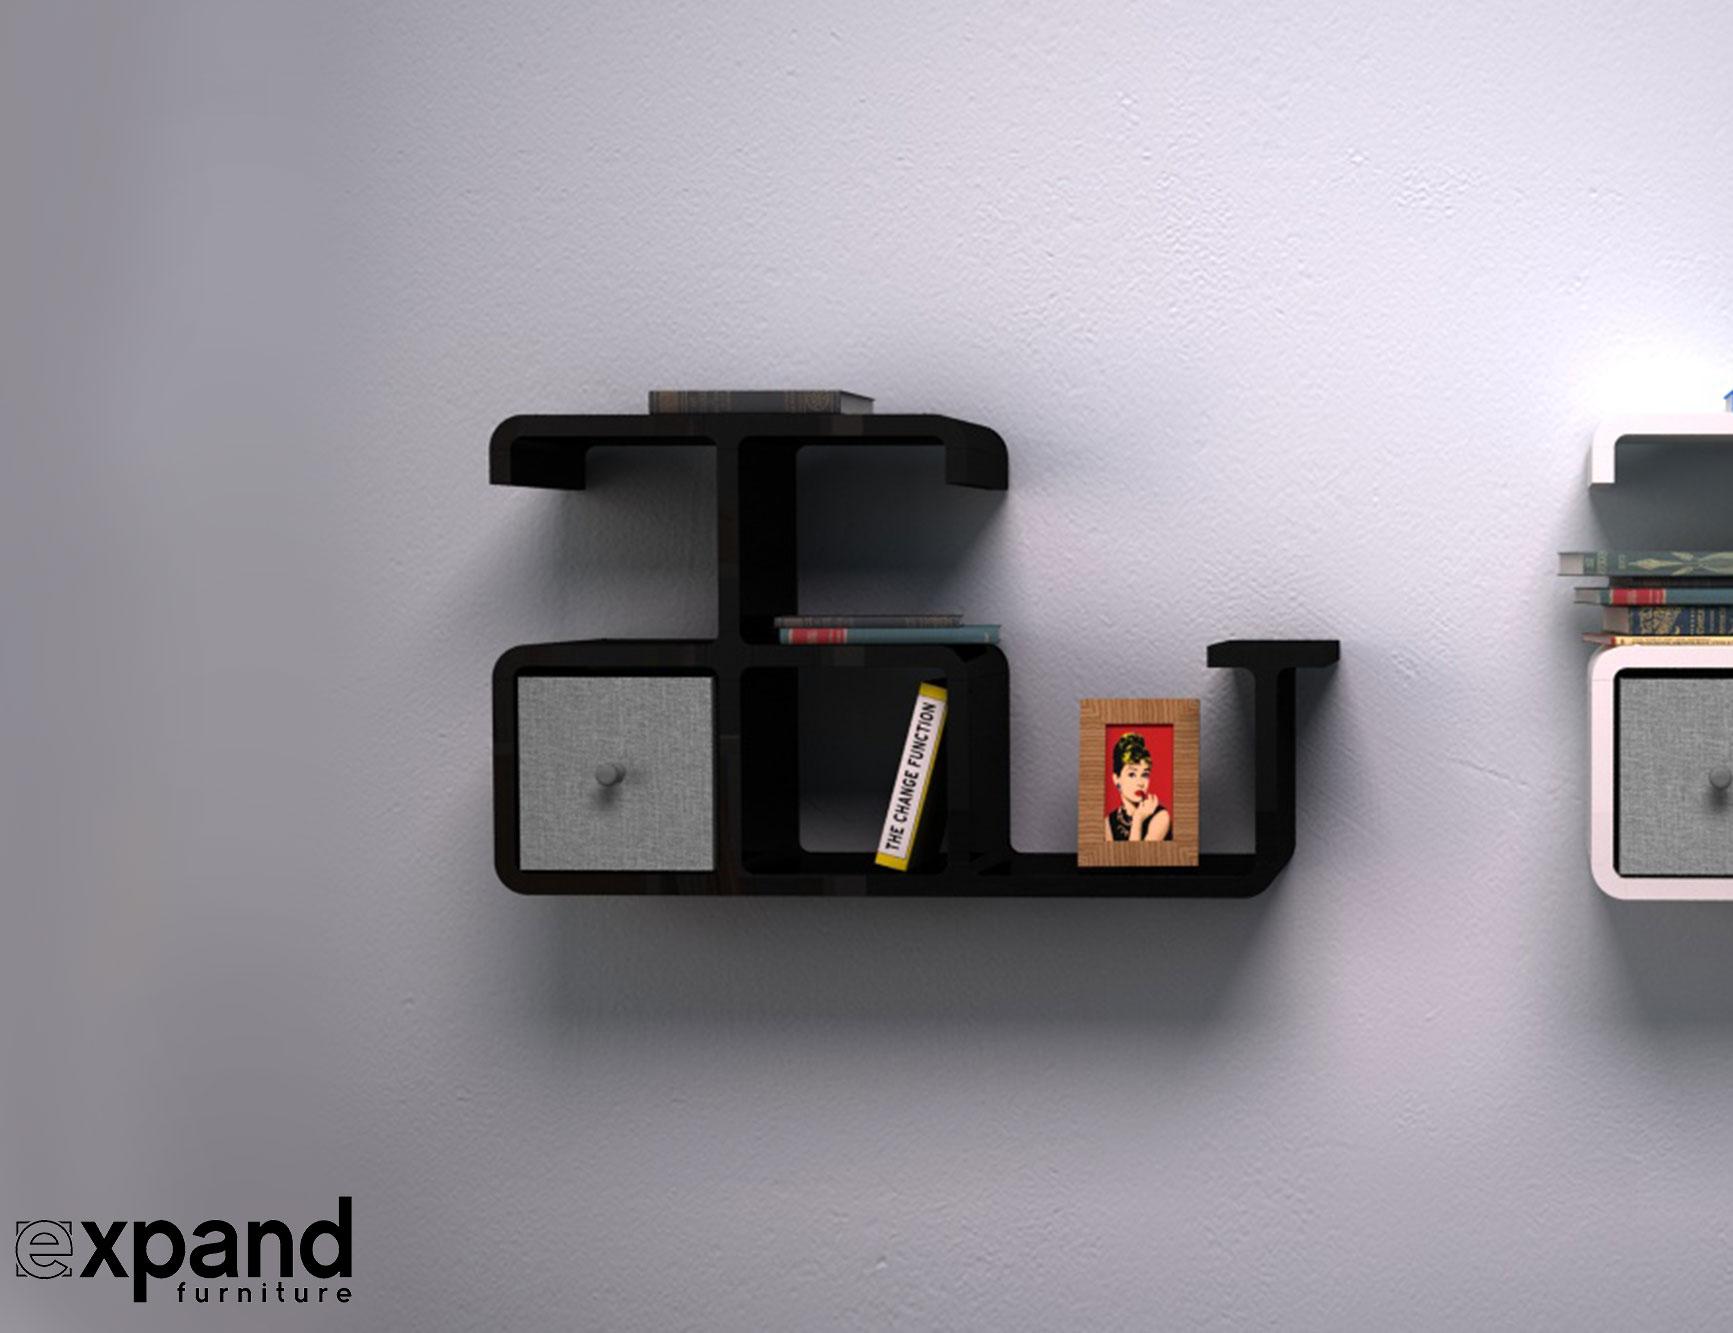 Modular Wall Storage Dolphin Shaped Wall Shelving Expand Furniture